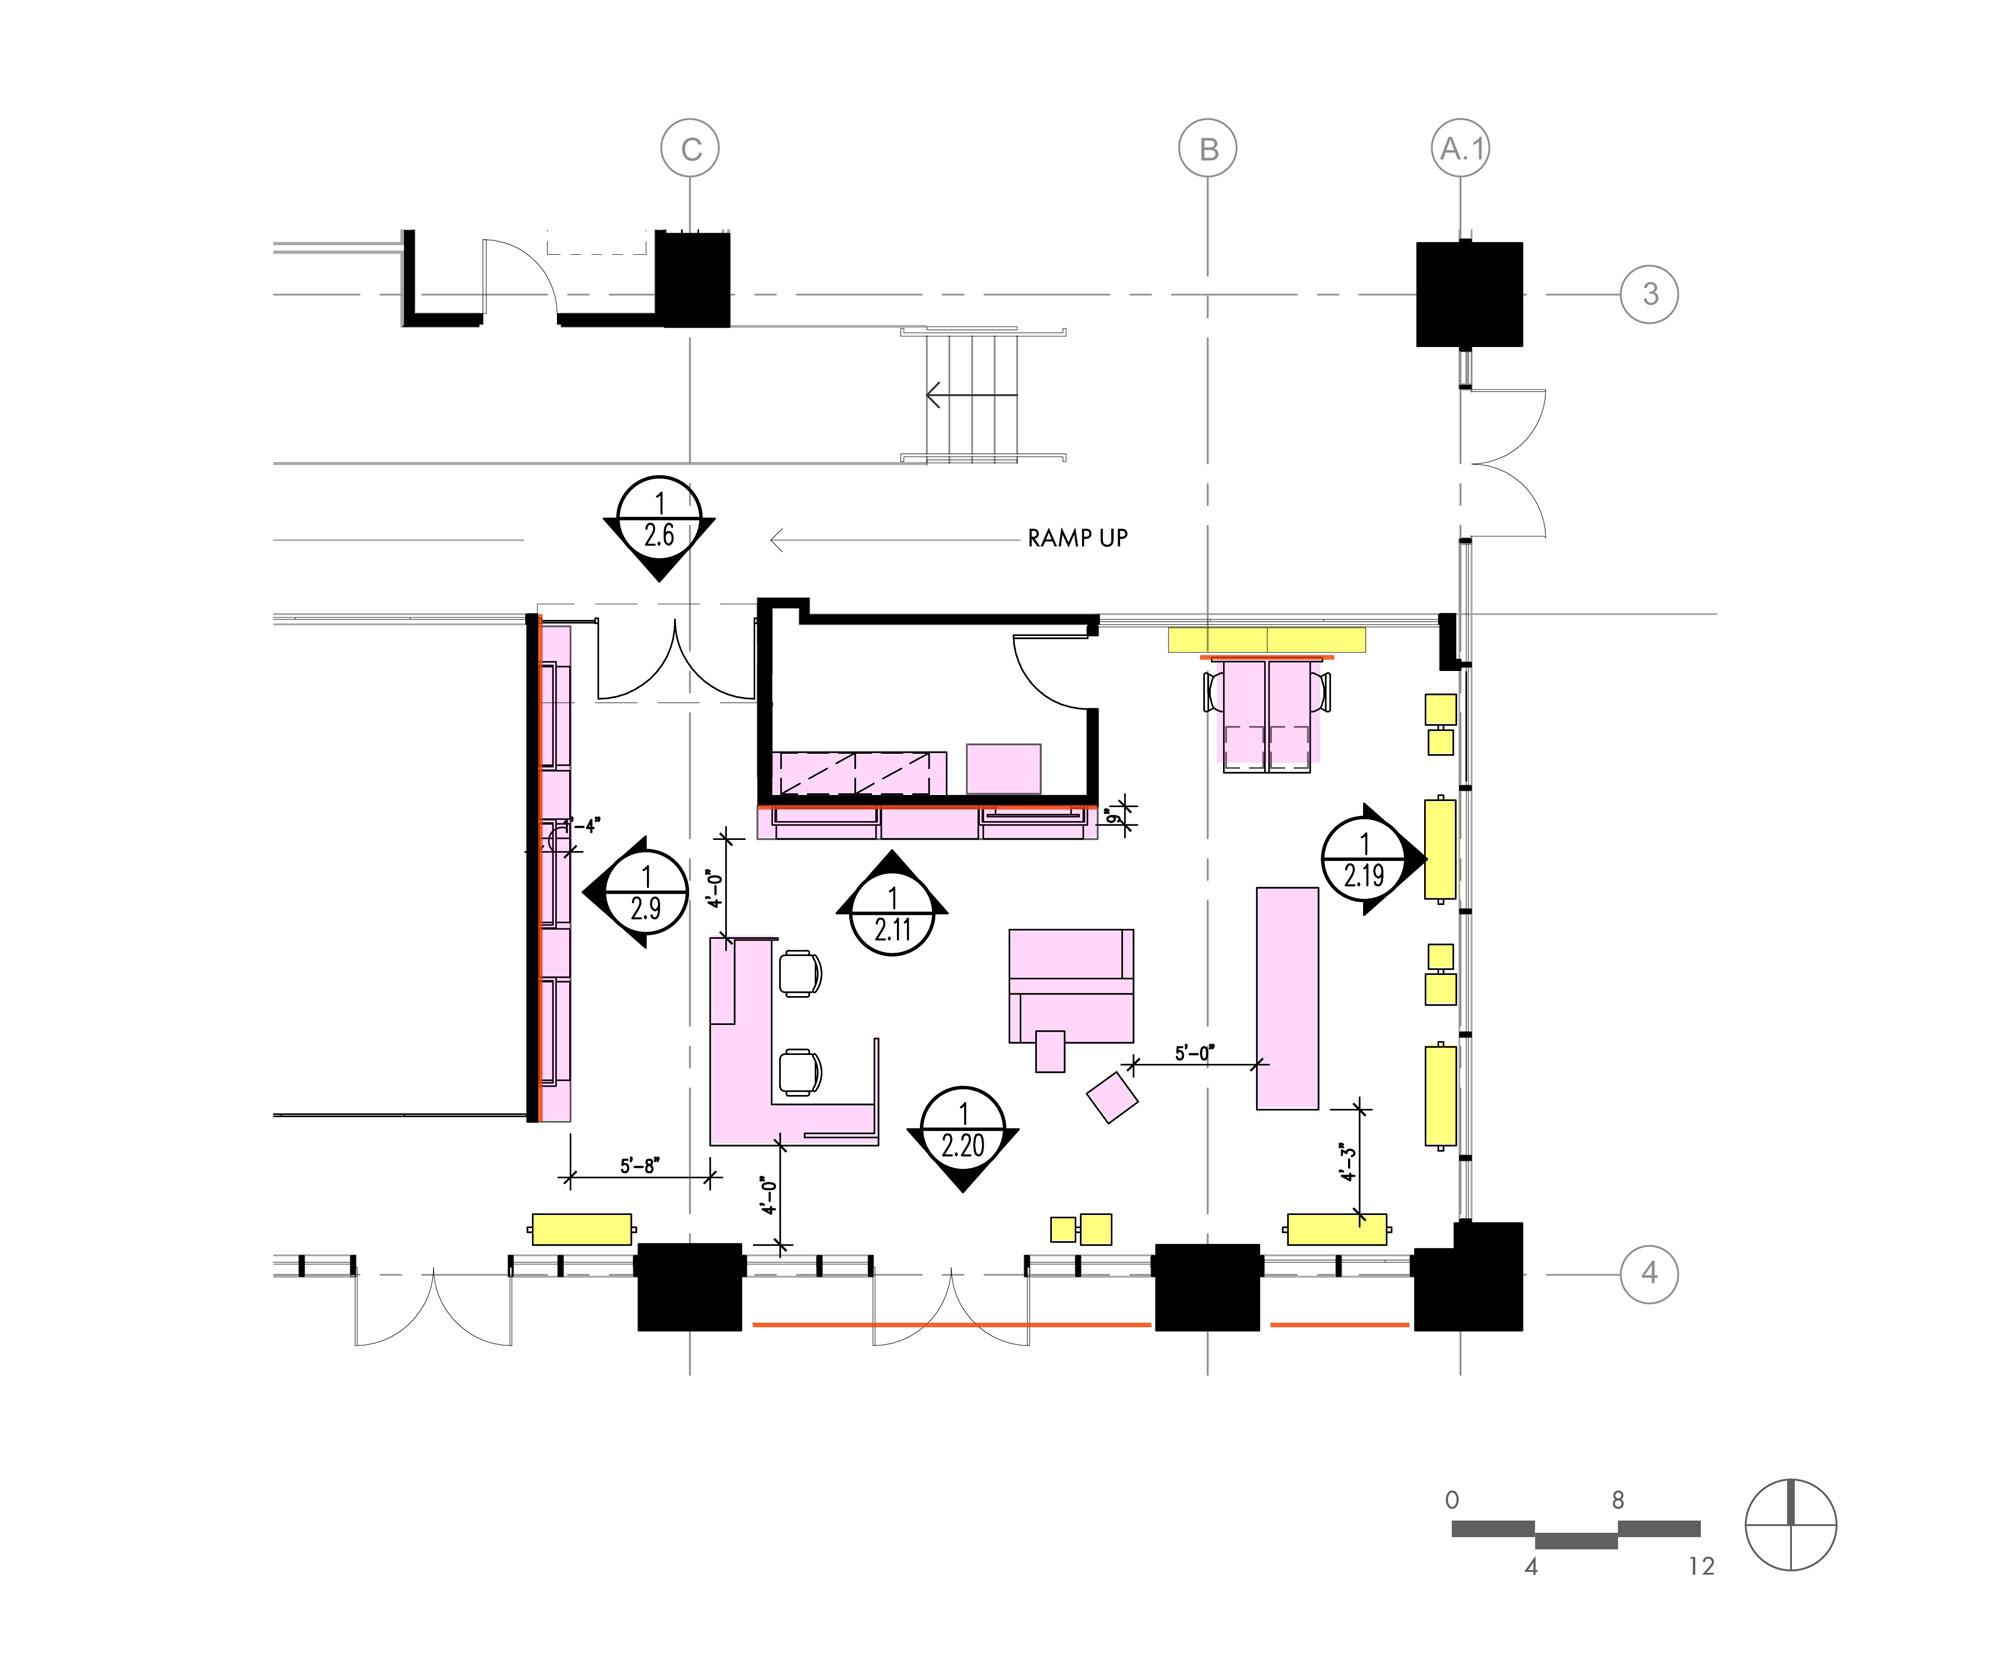 tsao-kp-tech-healthy-living-retail-plan-01.jpg